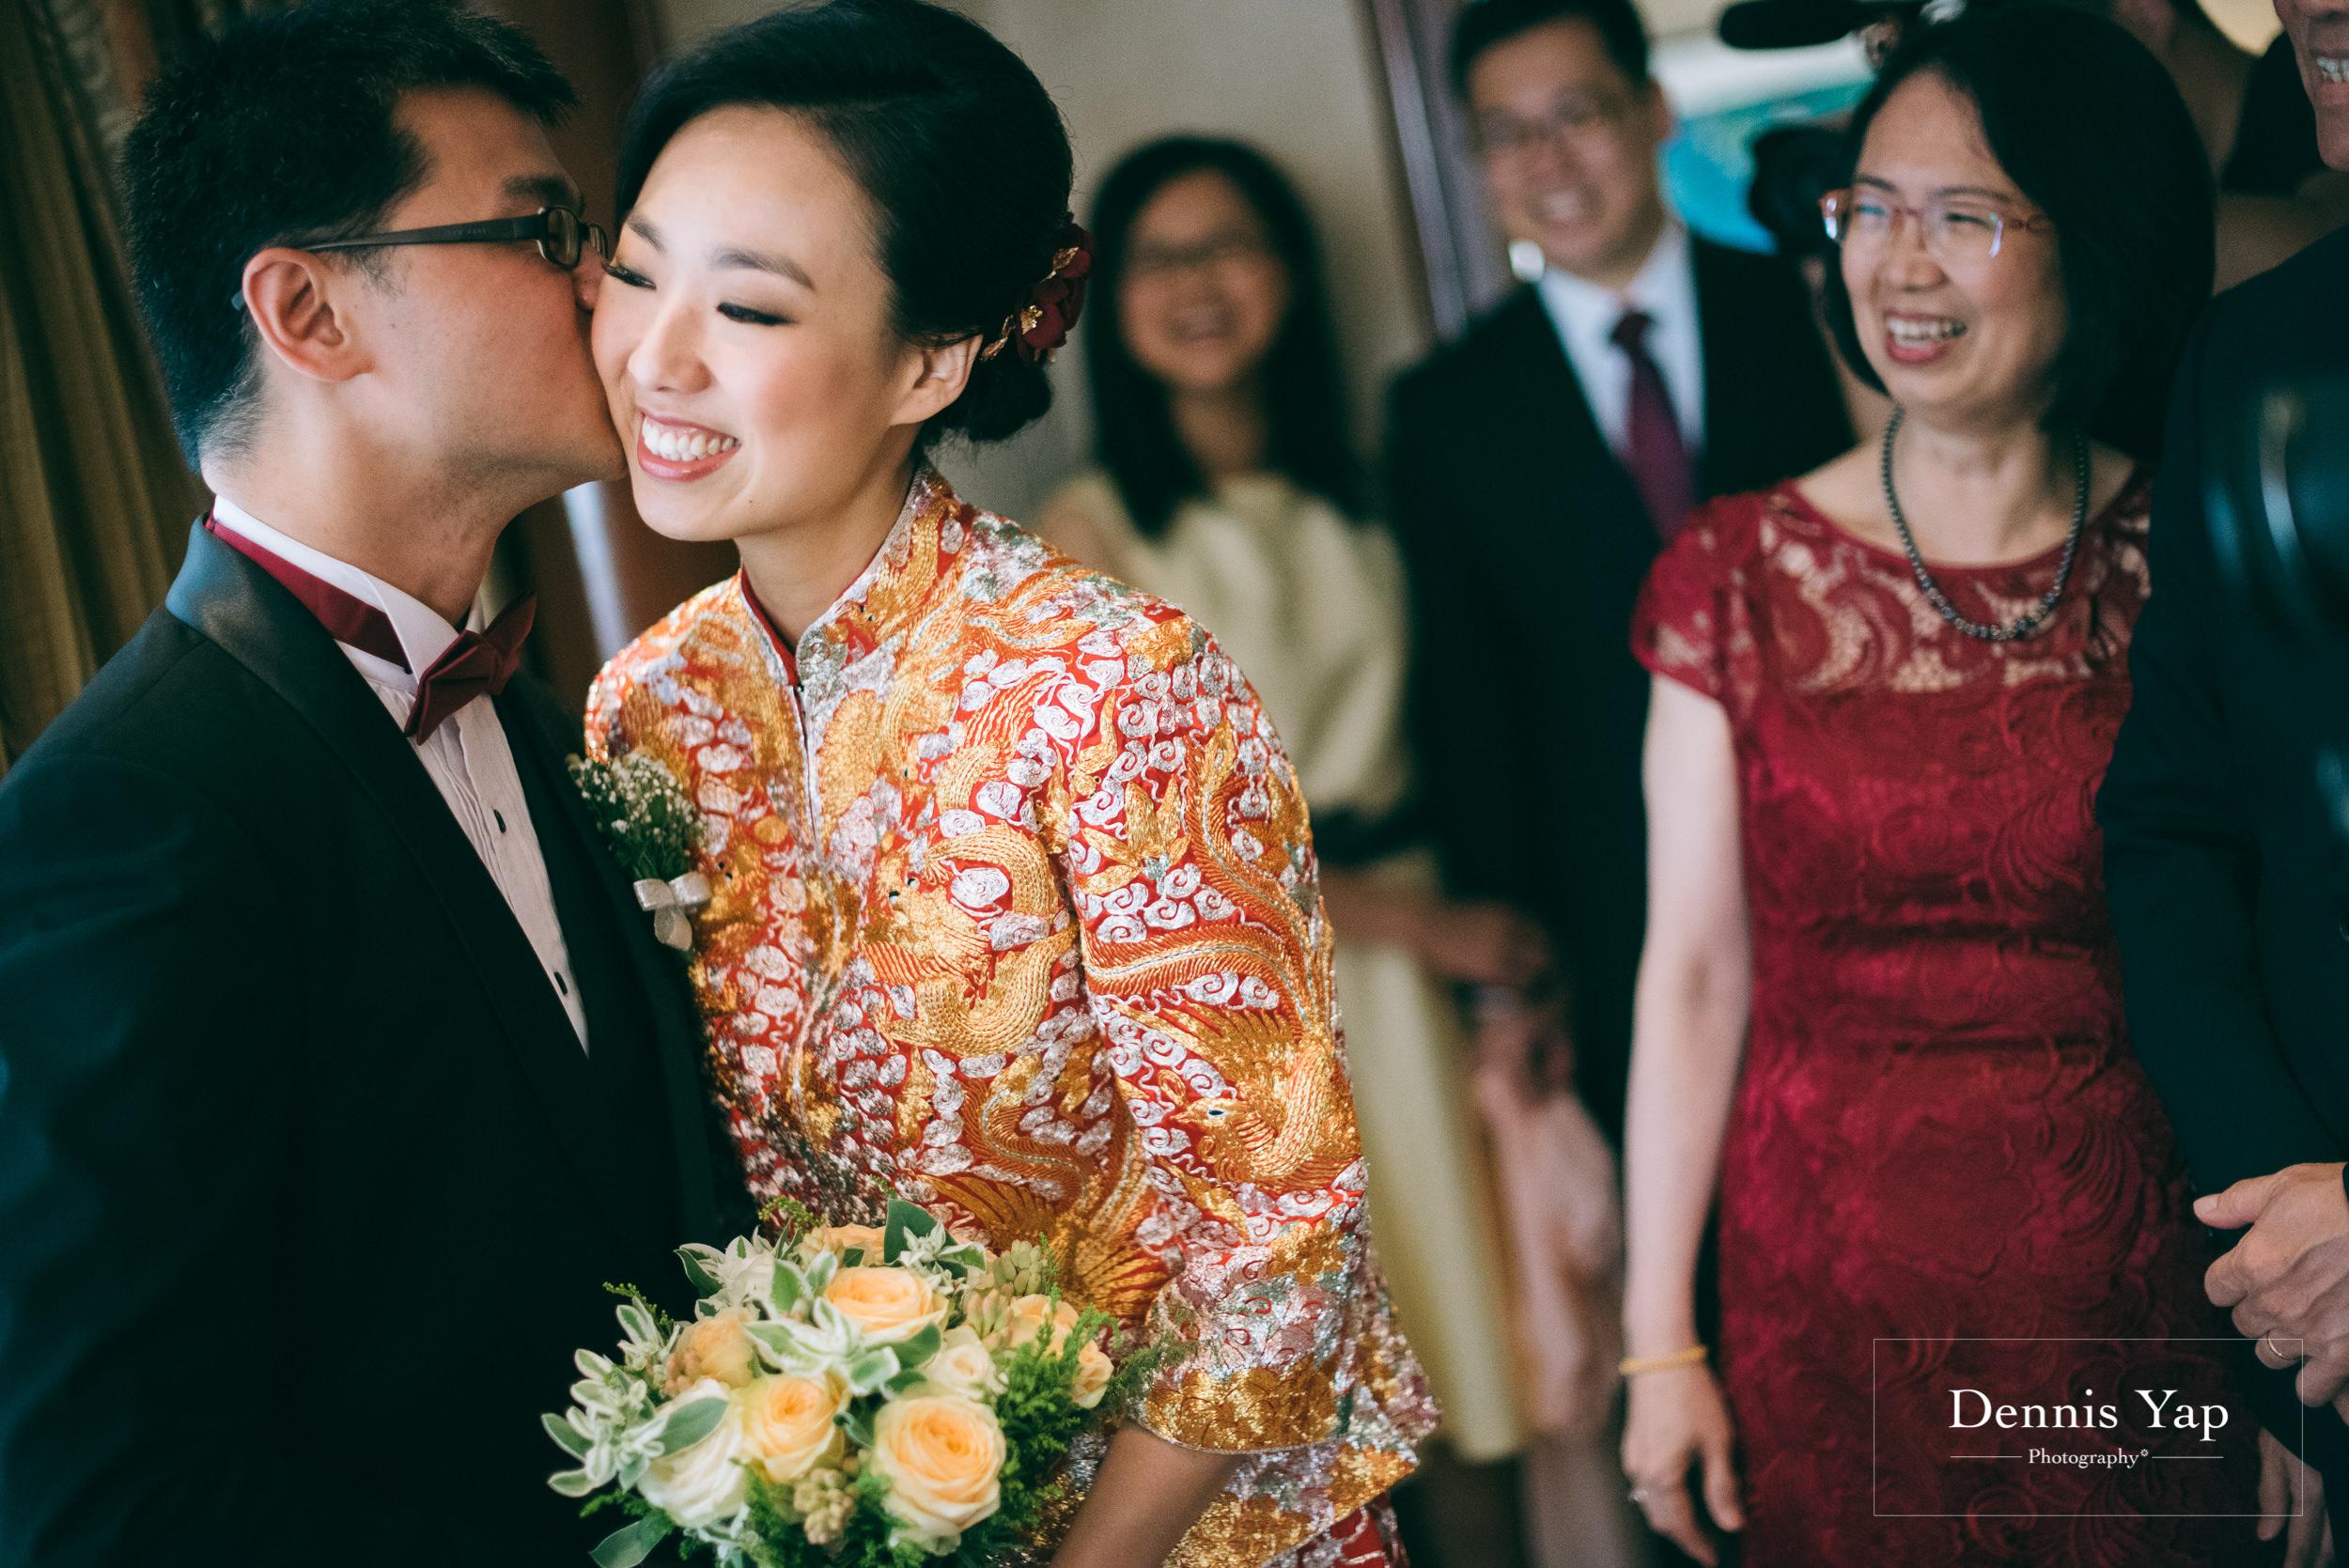 wai keong jenny wedding day bangsar dennis yap photography emotions beloved family-12.jpg